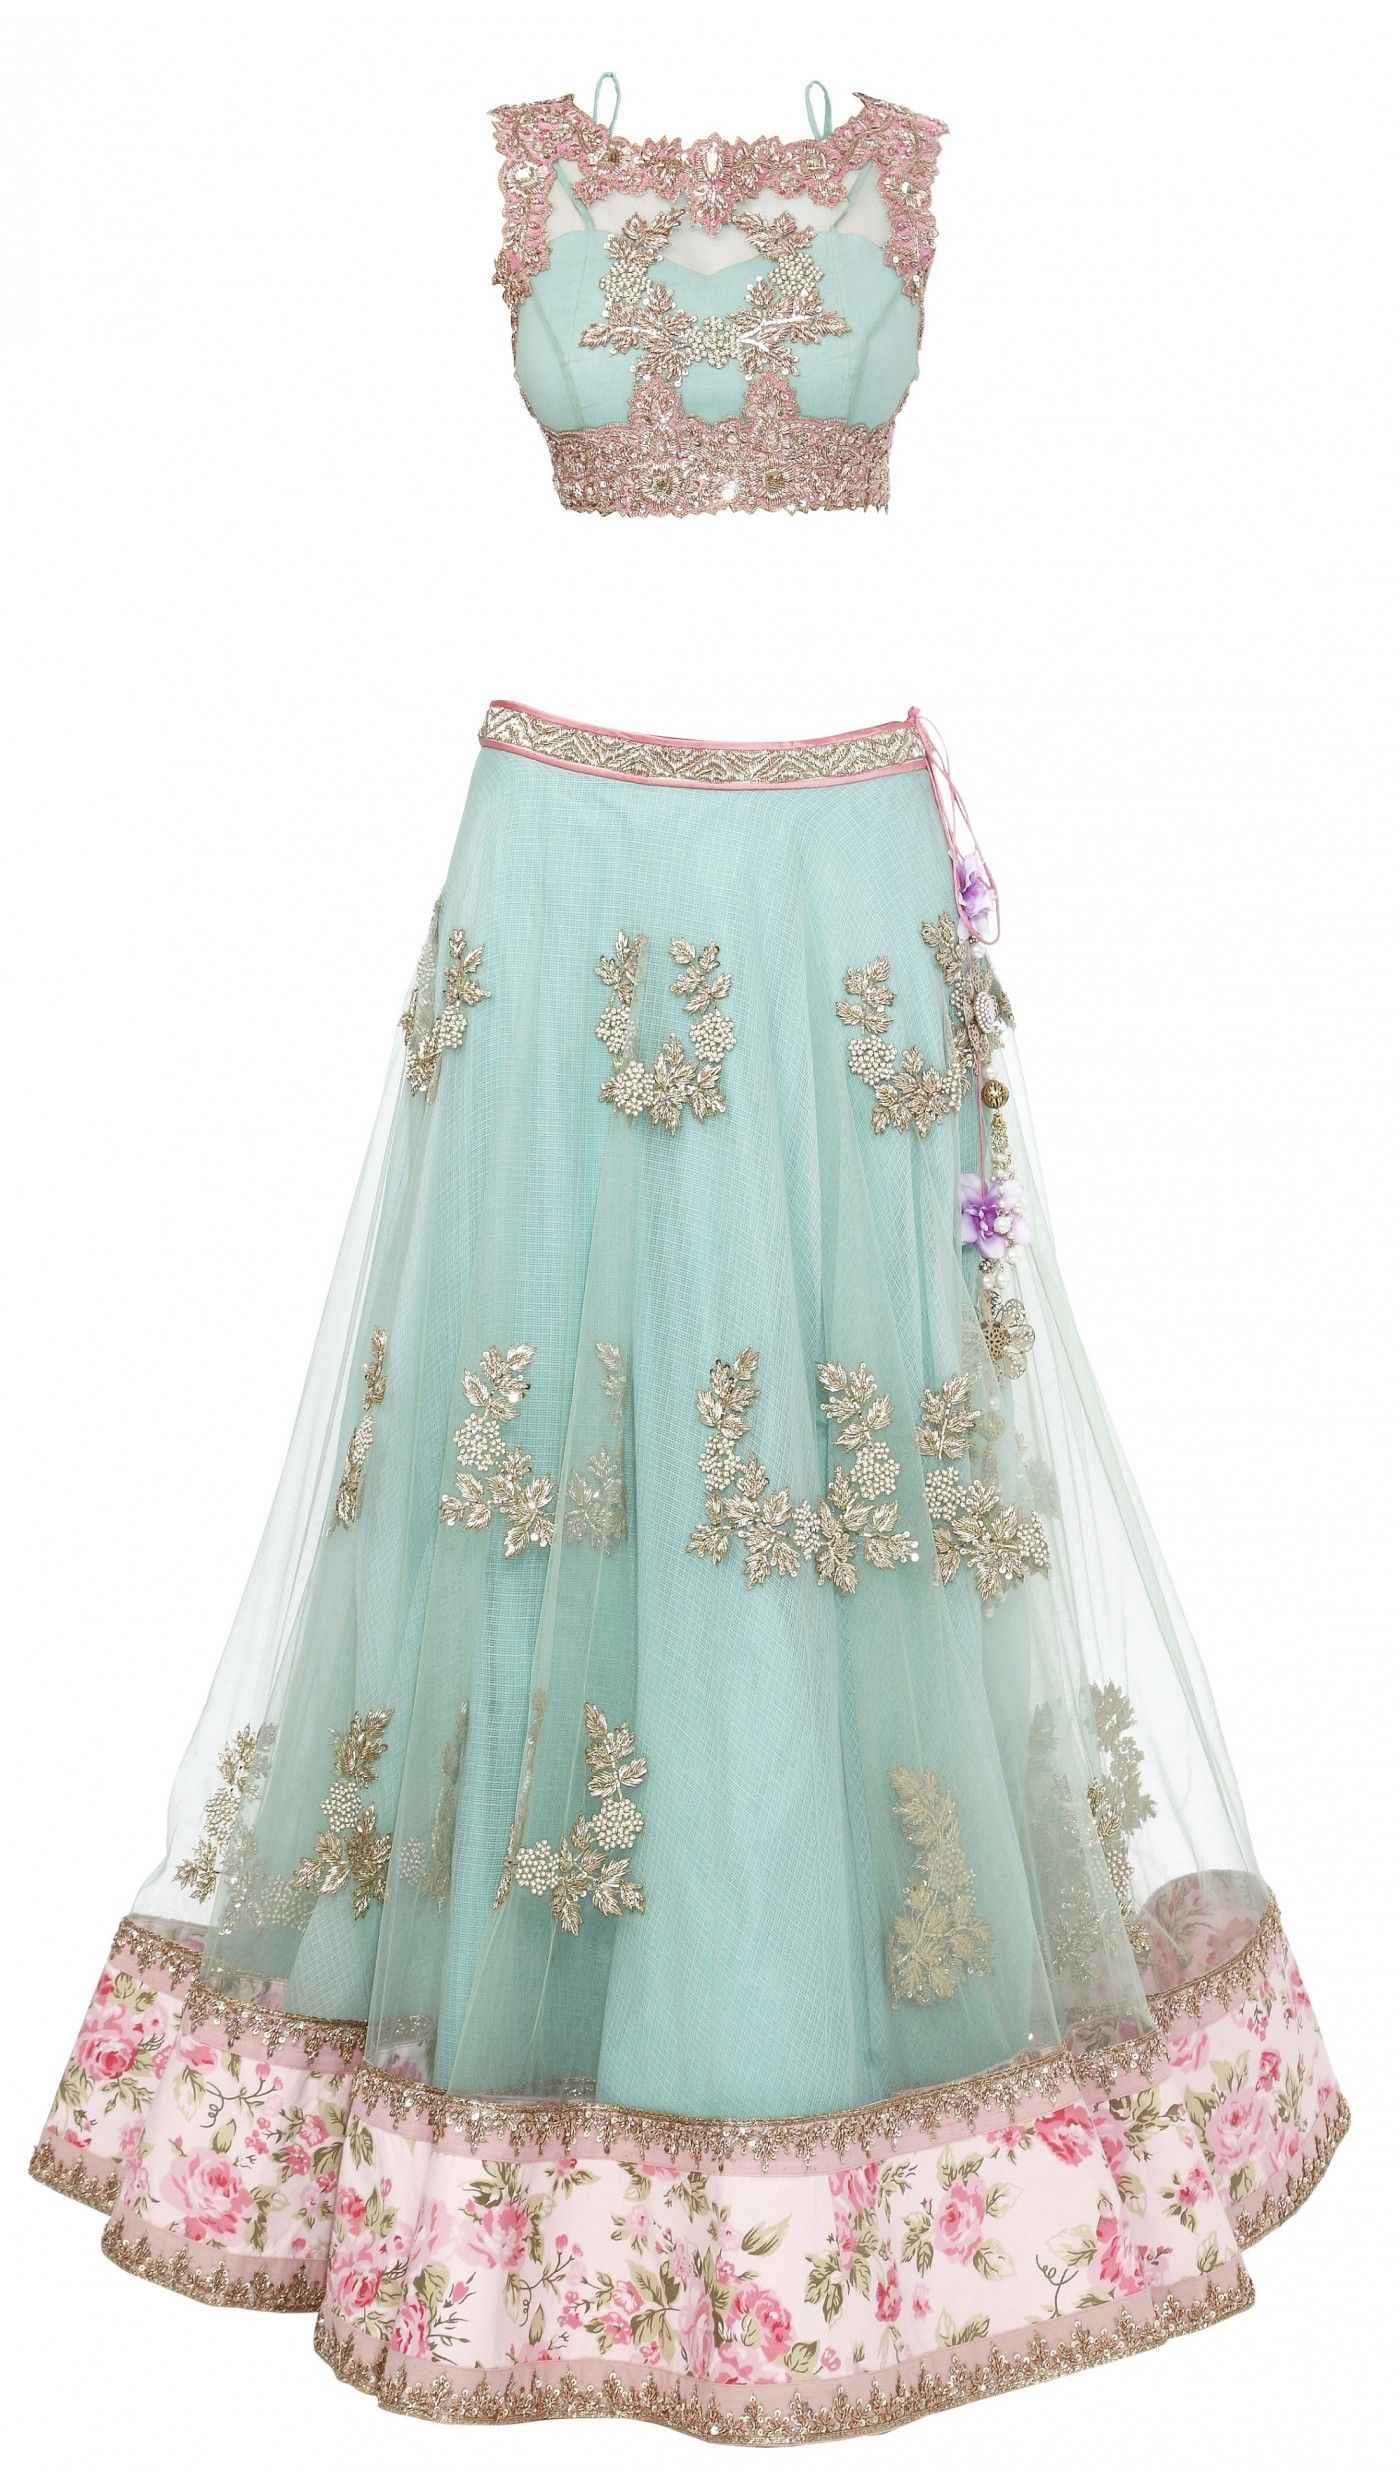 floral-lehenga-anushree-reddy [3] | Sari blouse styles | Pinterest ...